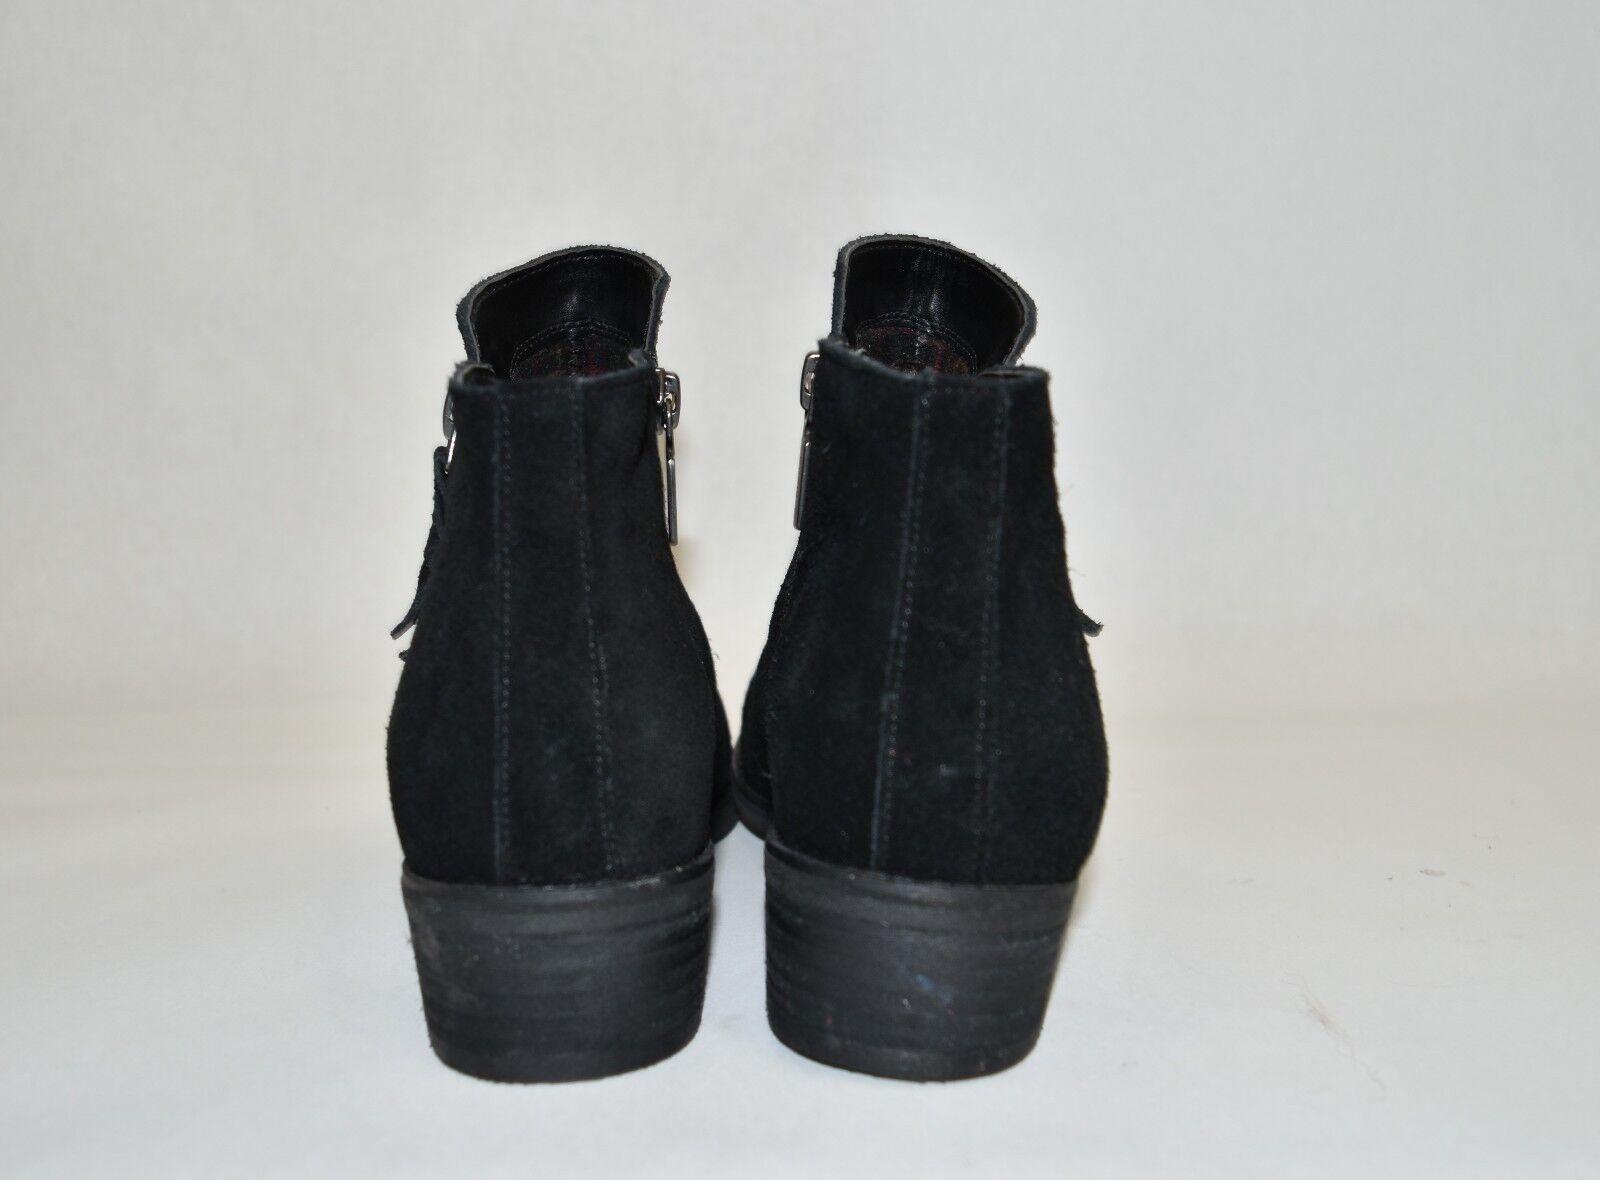 New  Blondo Liam Waterproof Waterproof Waterproof Bootie Black Suede B5859 Size 7 b778f2